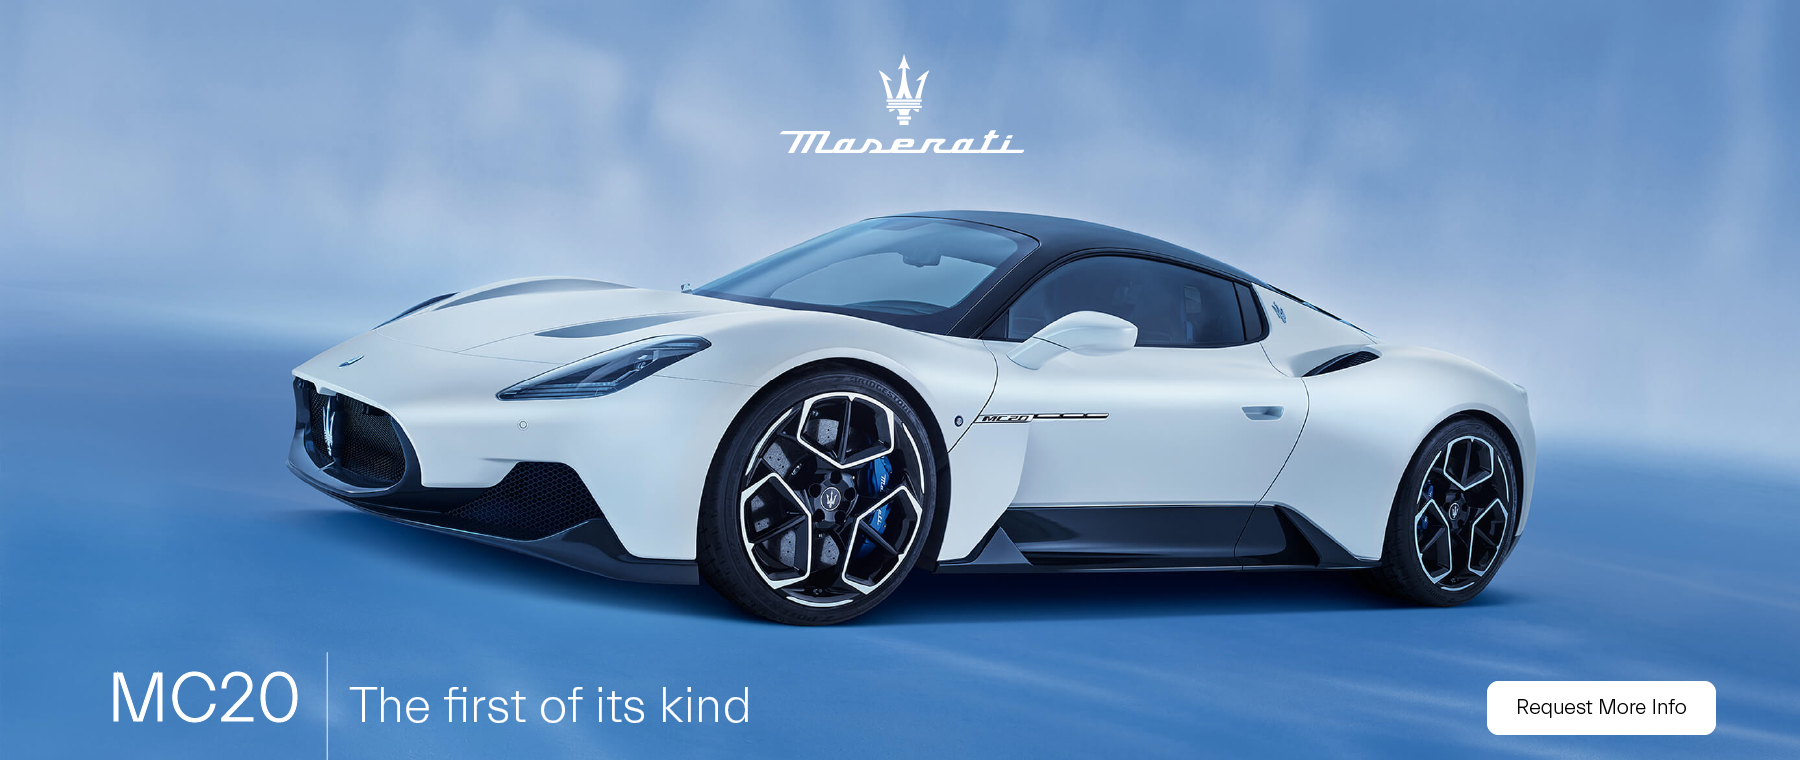 Maserati Of Central New Jersey Maserati Dealer In Edison Nj